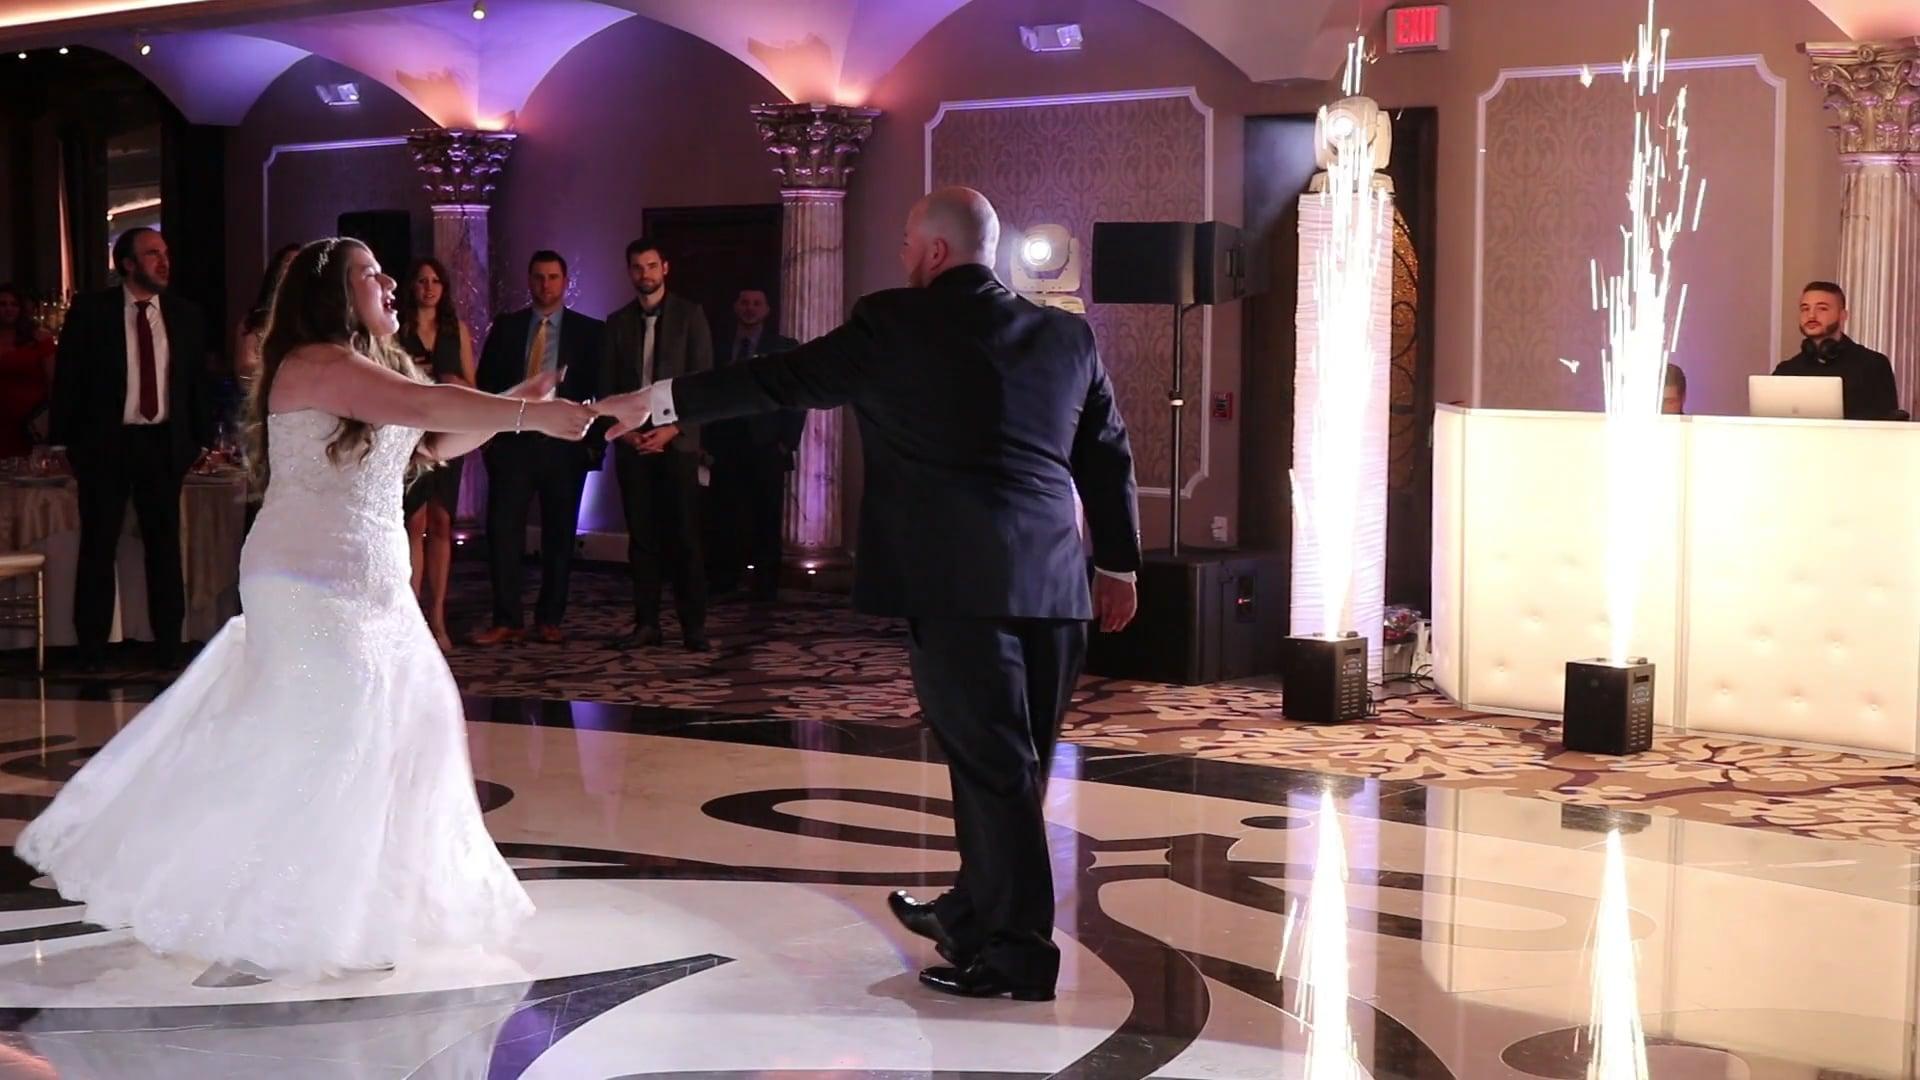 AJH Entertainment Weddings: Jamie & John's Wedding, Grand Marquis, Old Bridge NJ